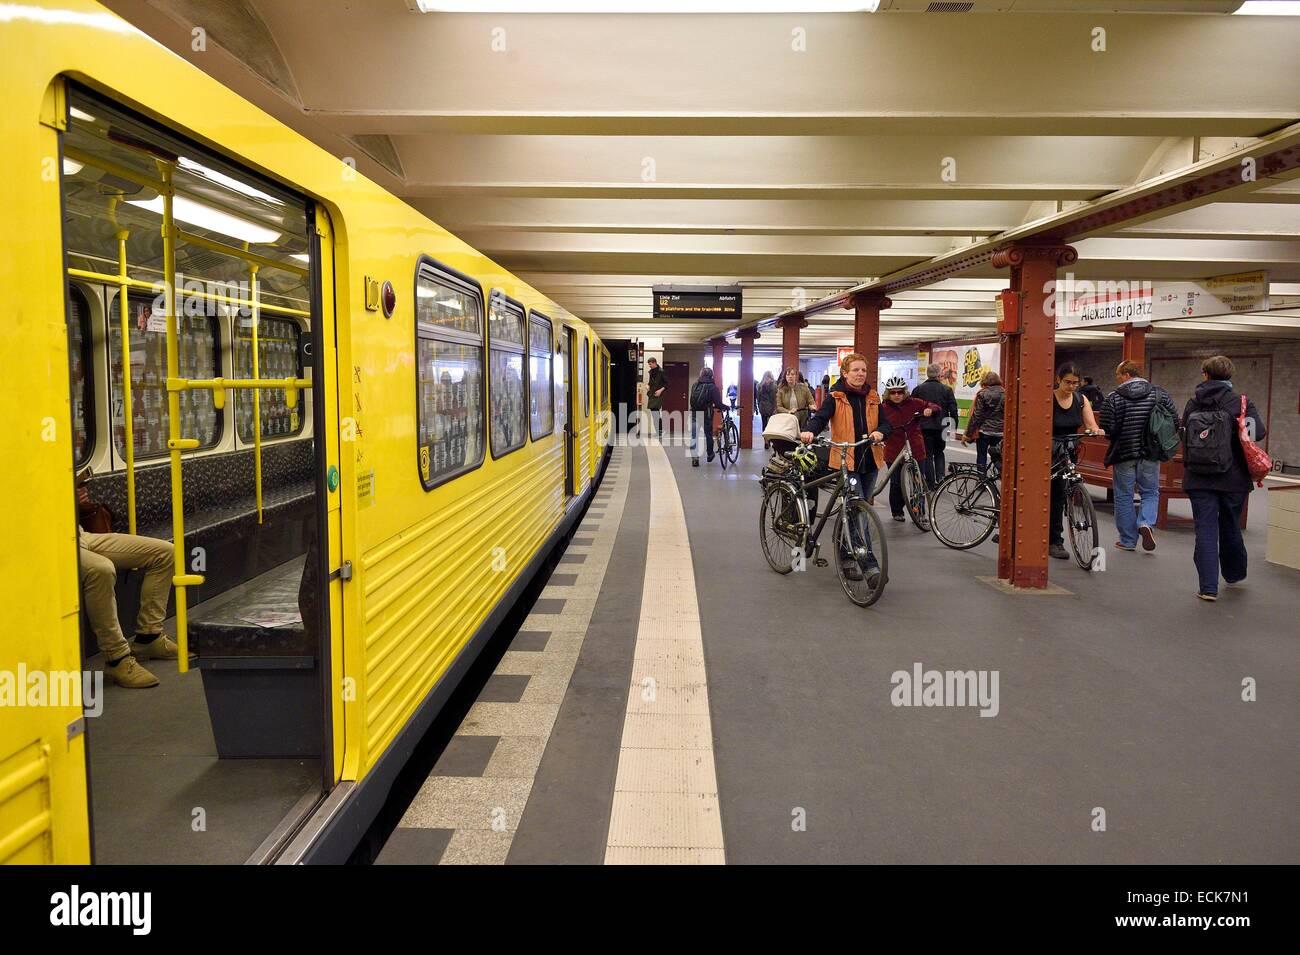 Deutschland, Berlin, U-Bahn, u-Bahnstation am Senefelderplatz Stockbild